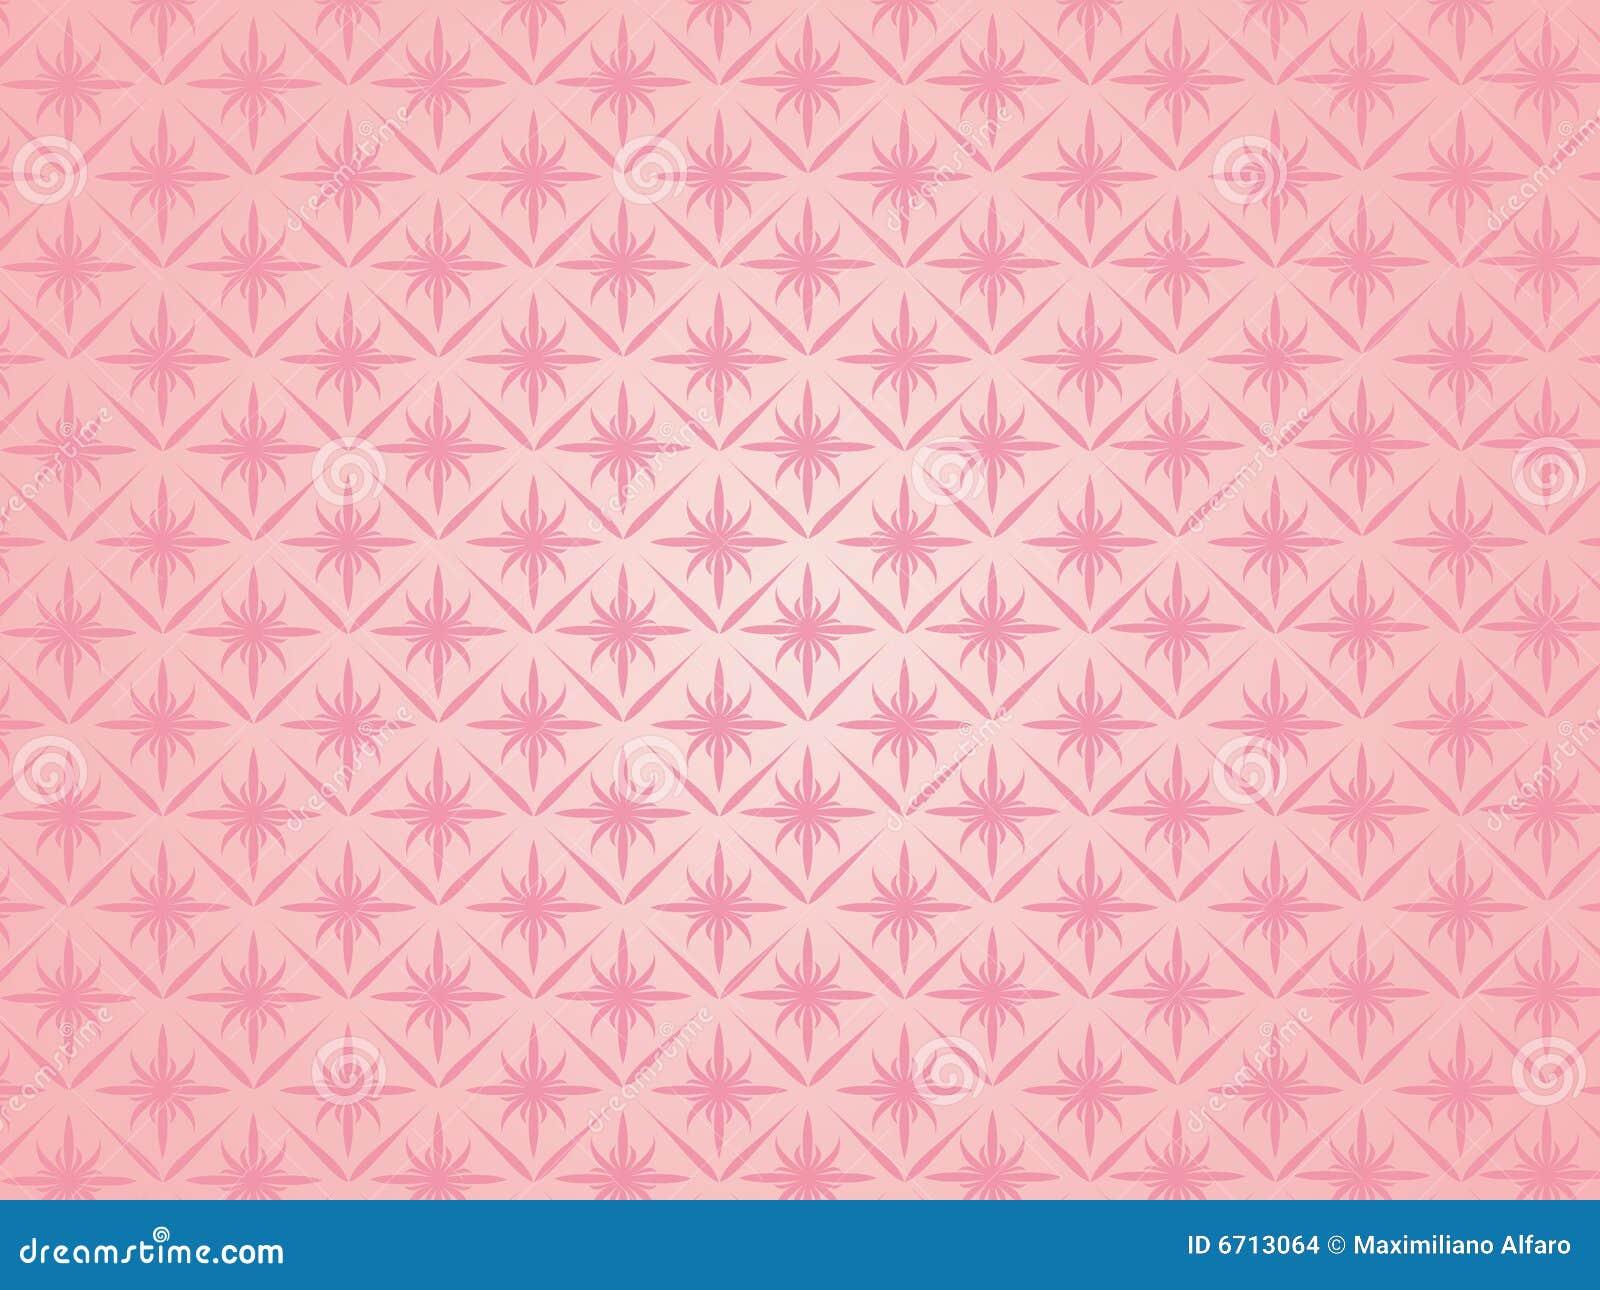 Tapisserie A Motif Rose : Tapisserie rose illustration stock image du courbes